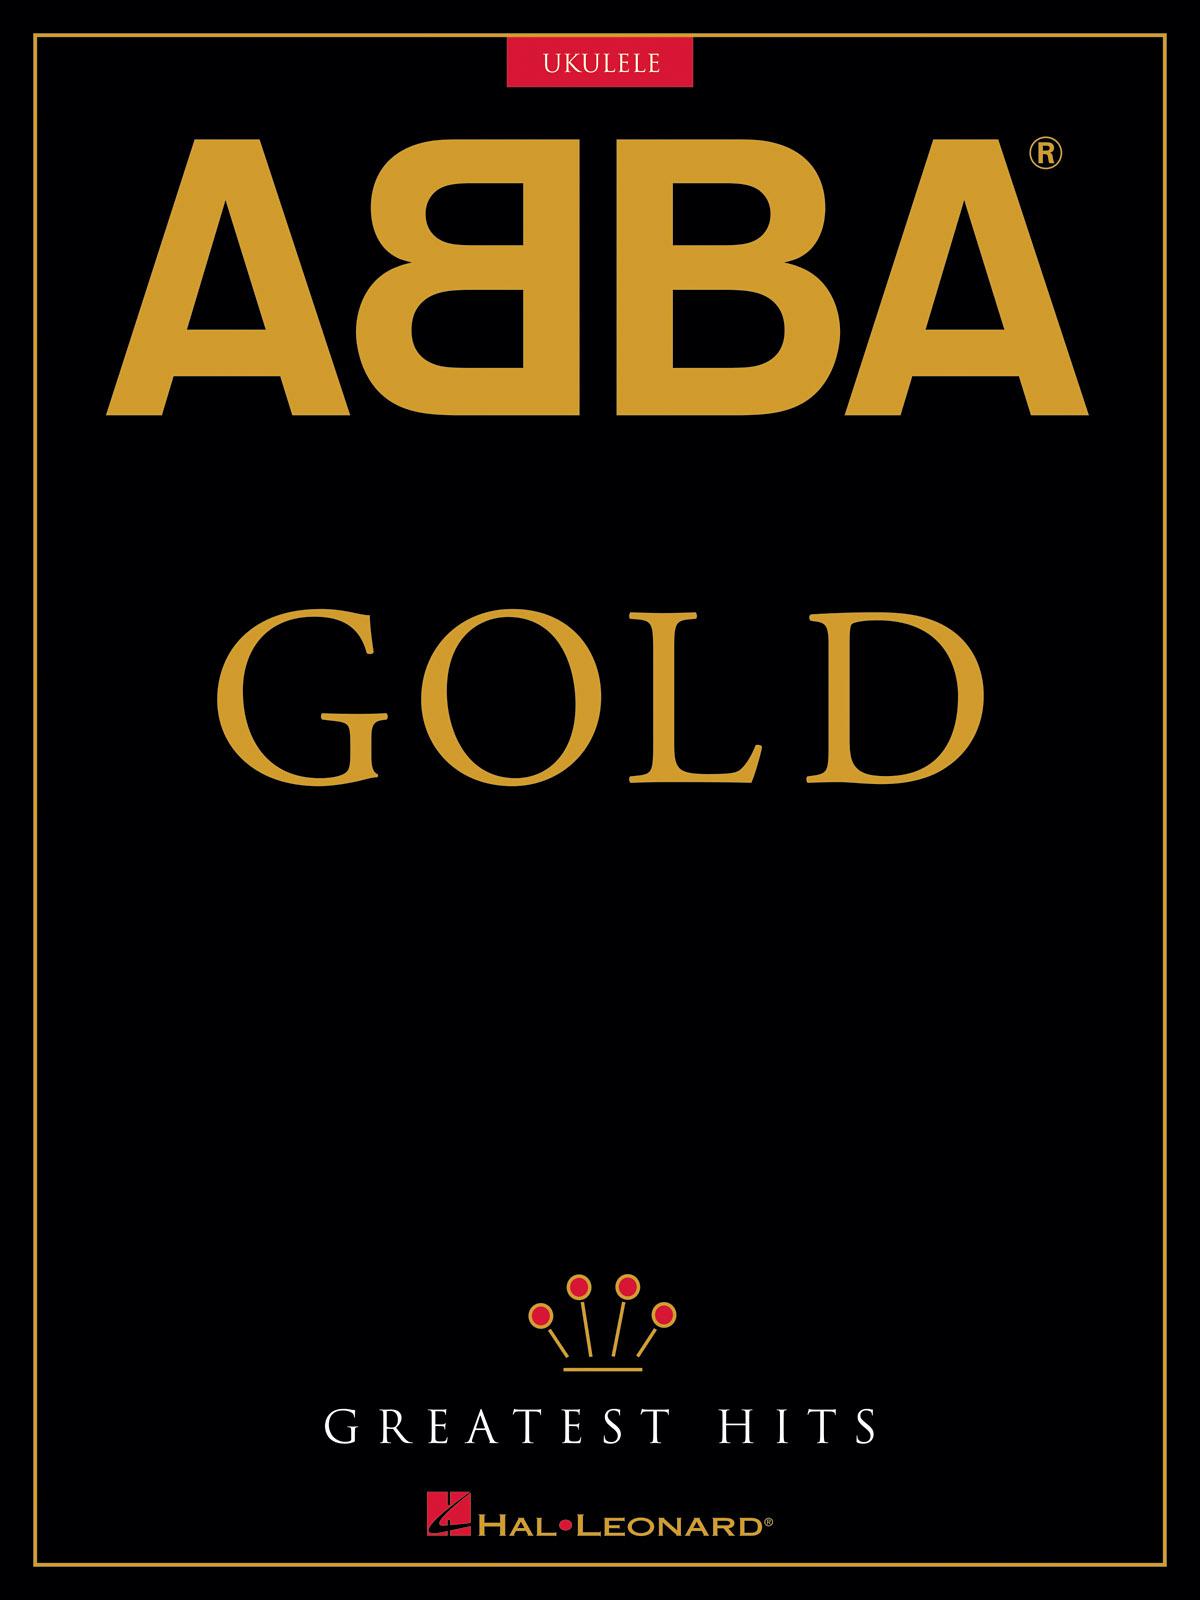 ABBA Gold - Greatest Hits für Ukulele